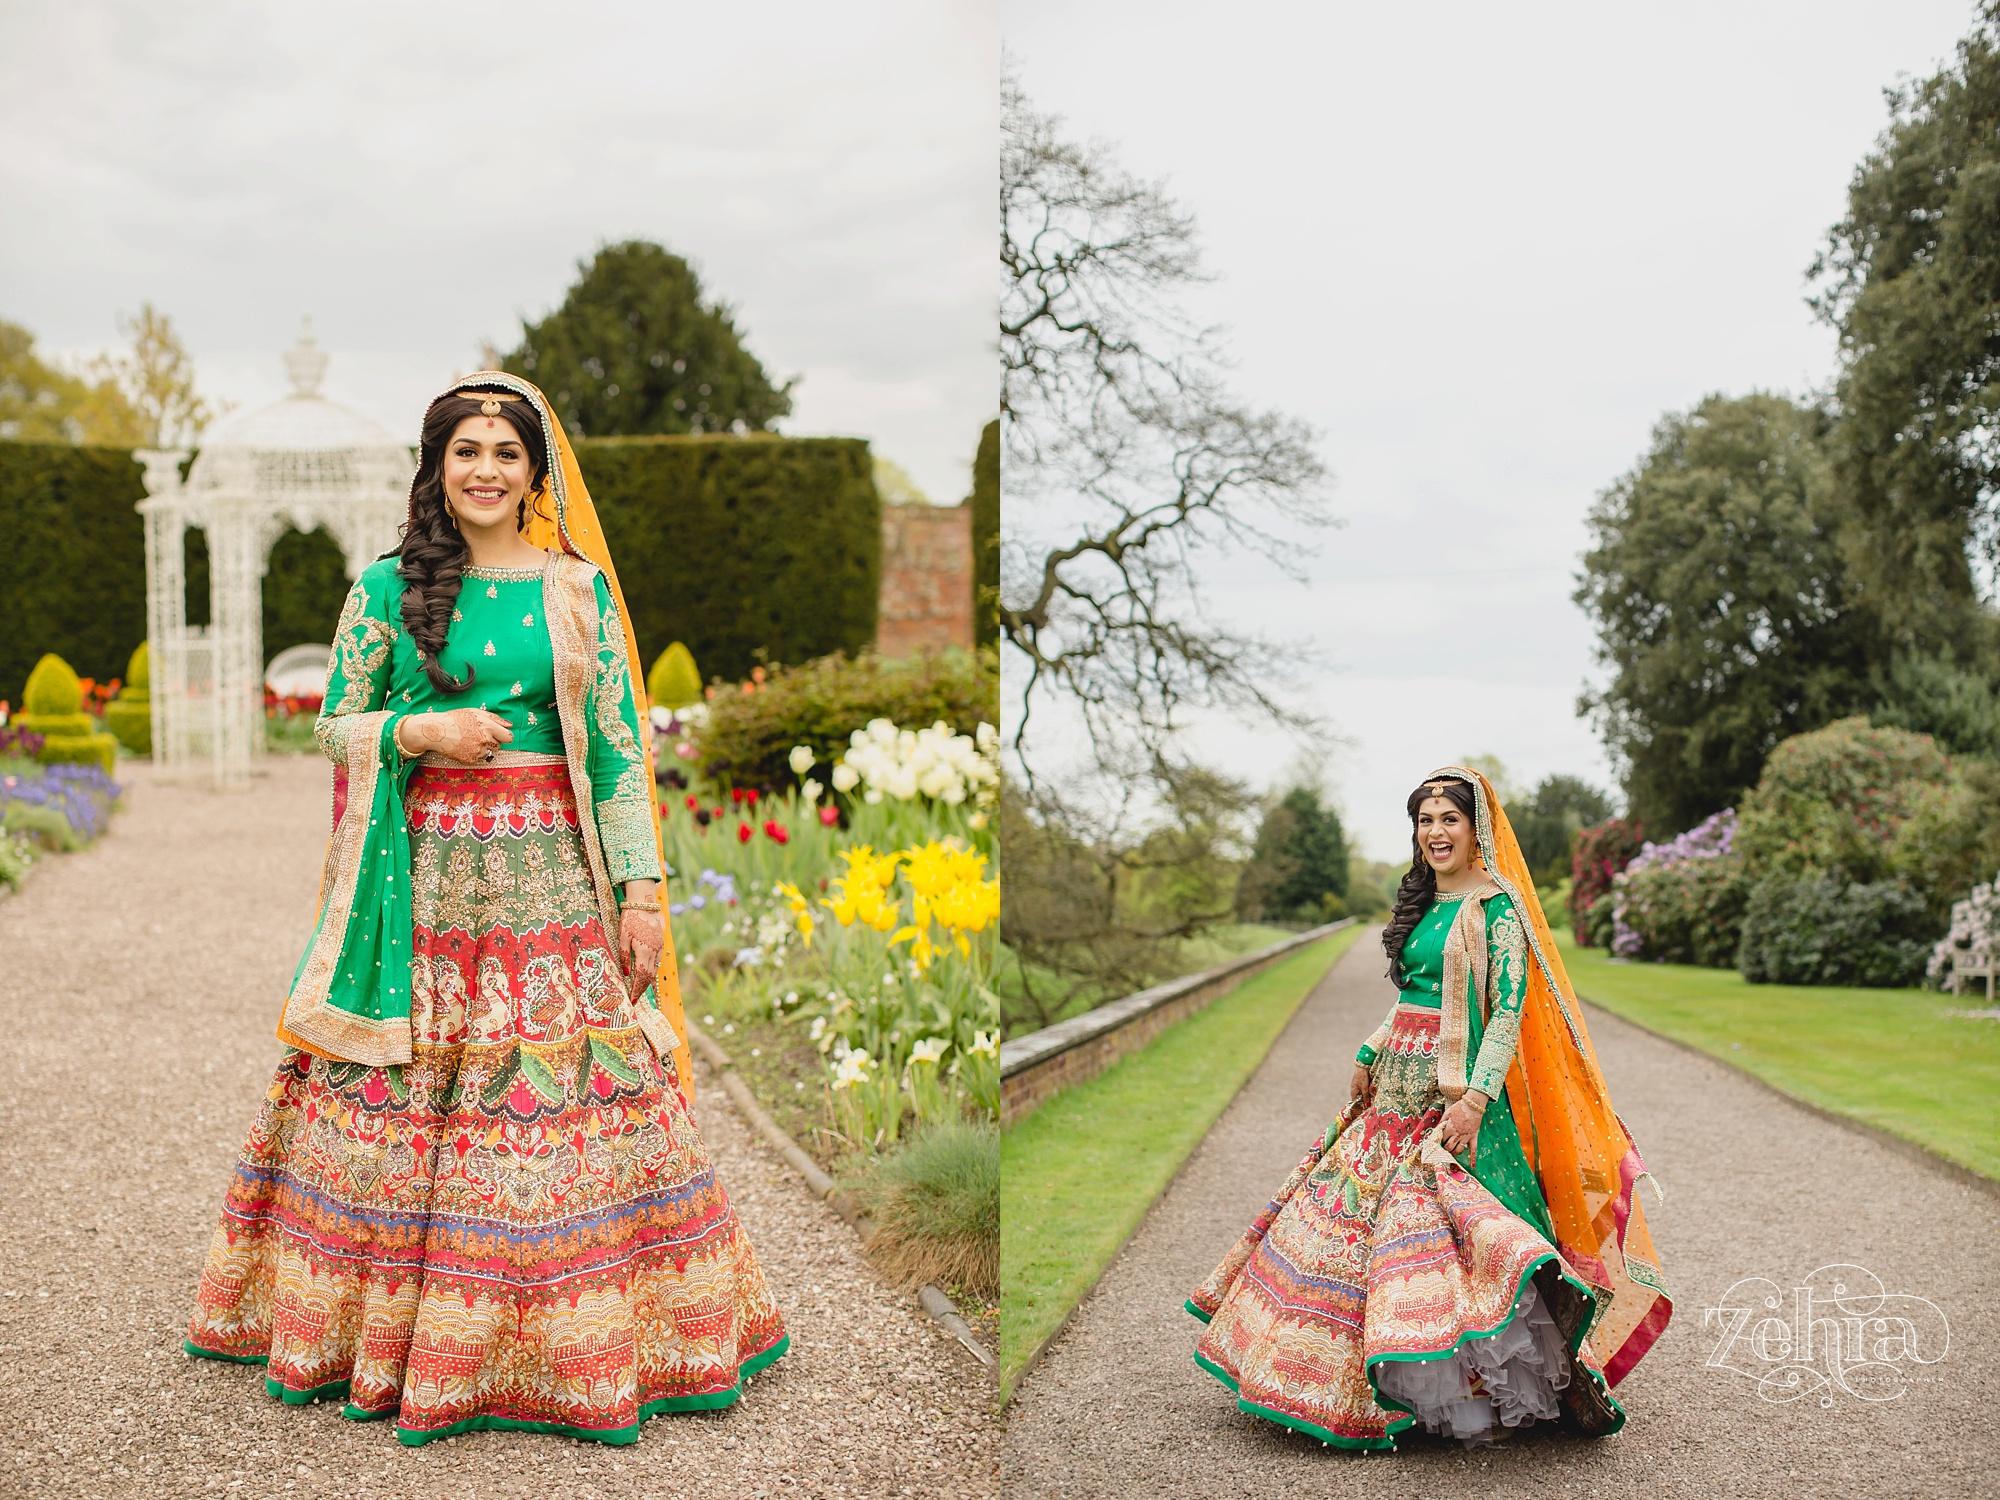 zehra wedding photographer arley hall cheshire008.jpg